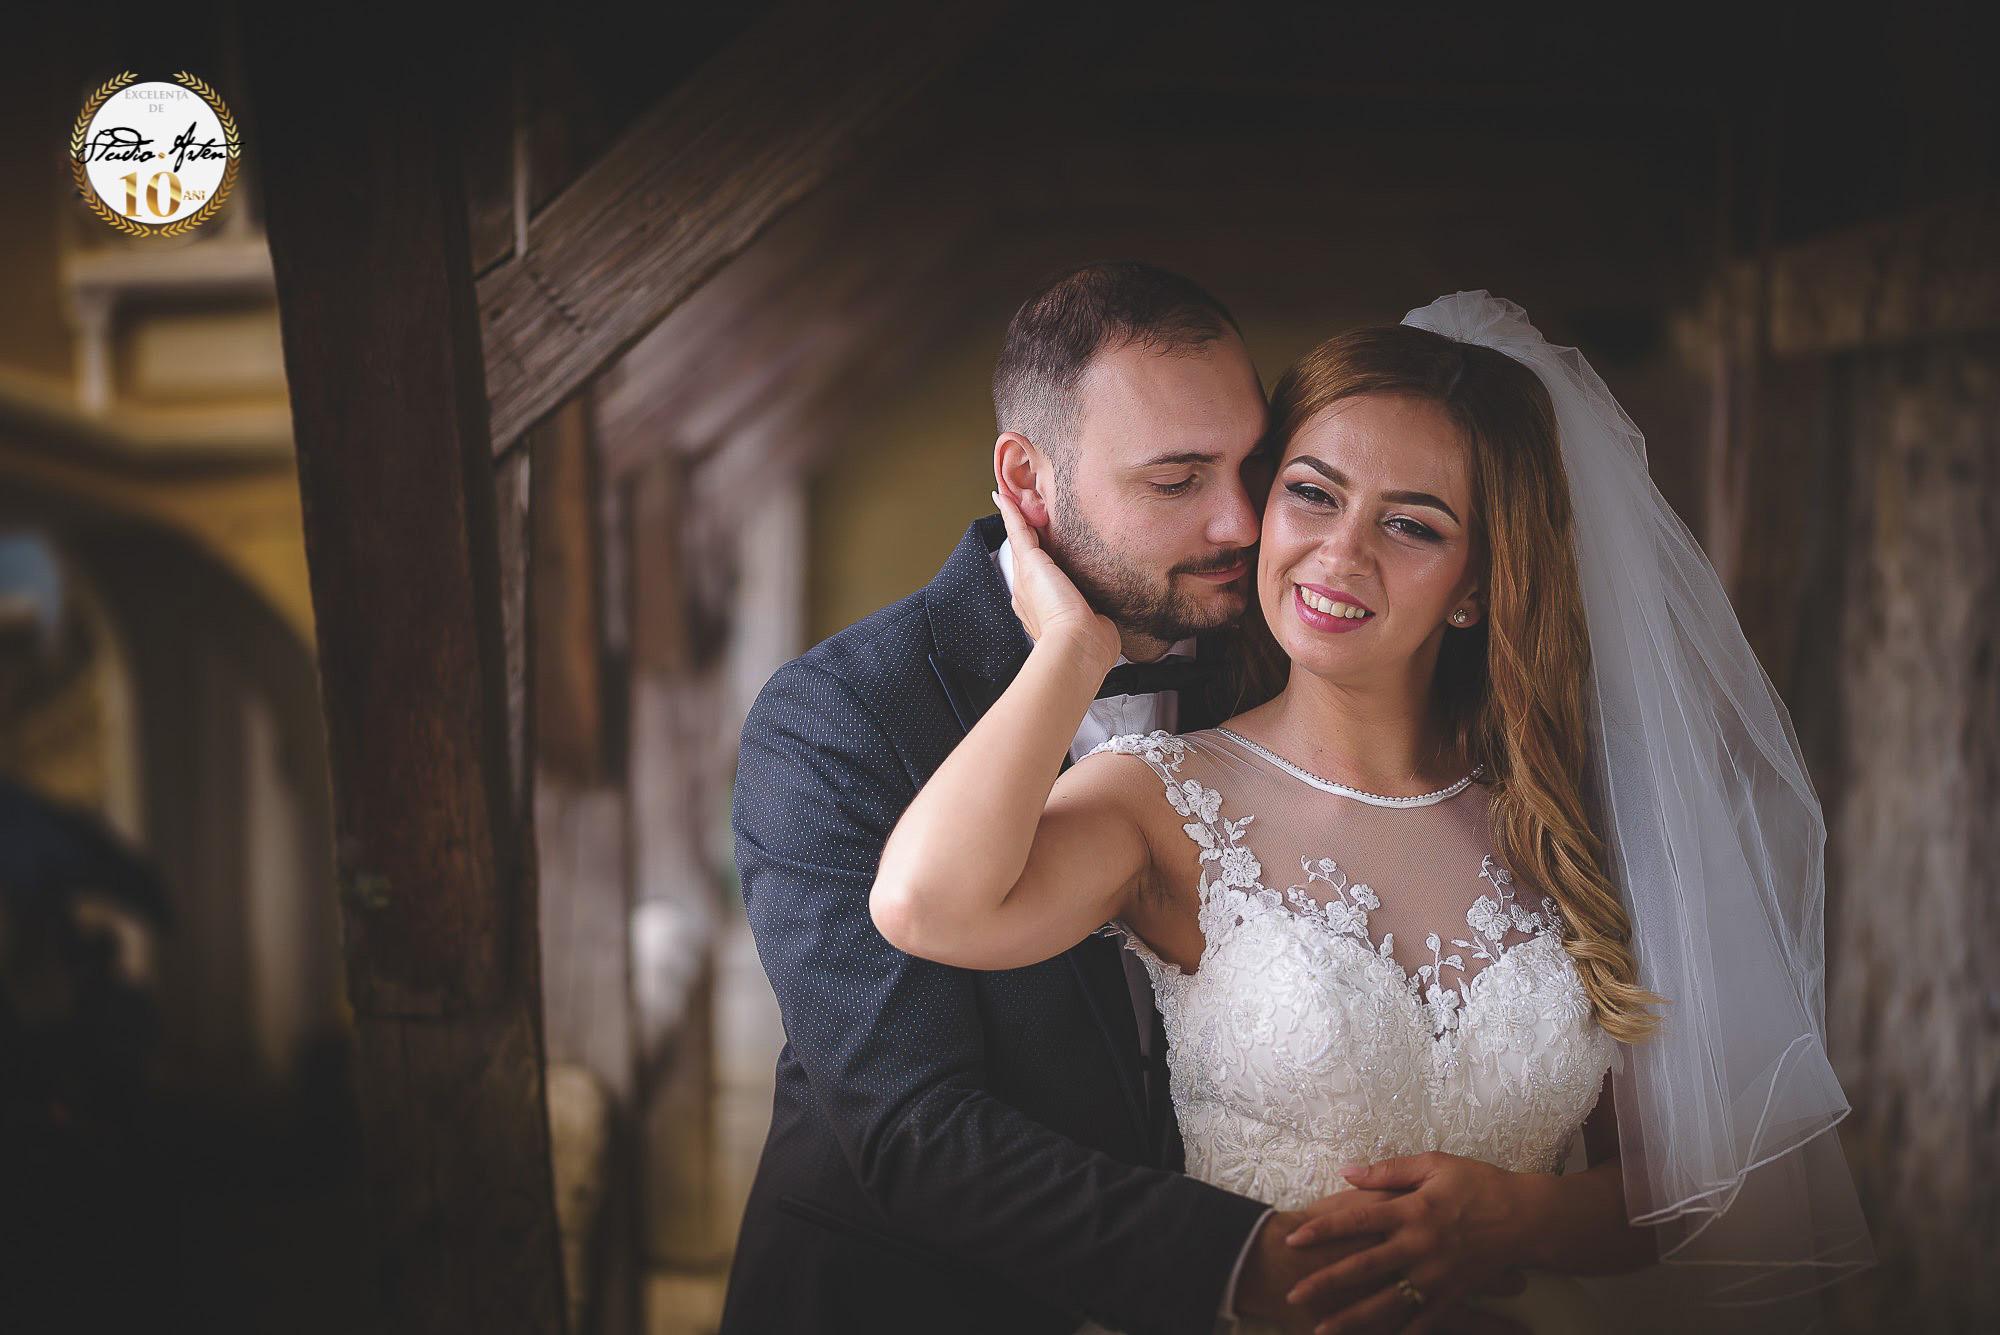 Fotograf nunta mures, fotografii de nunta, sedinta foto nunta, sedinta foto dupa nunta, foto logodna, foto nunta, poze nunta, trash the dress, album nunta personalizat, Studio Arten